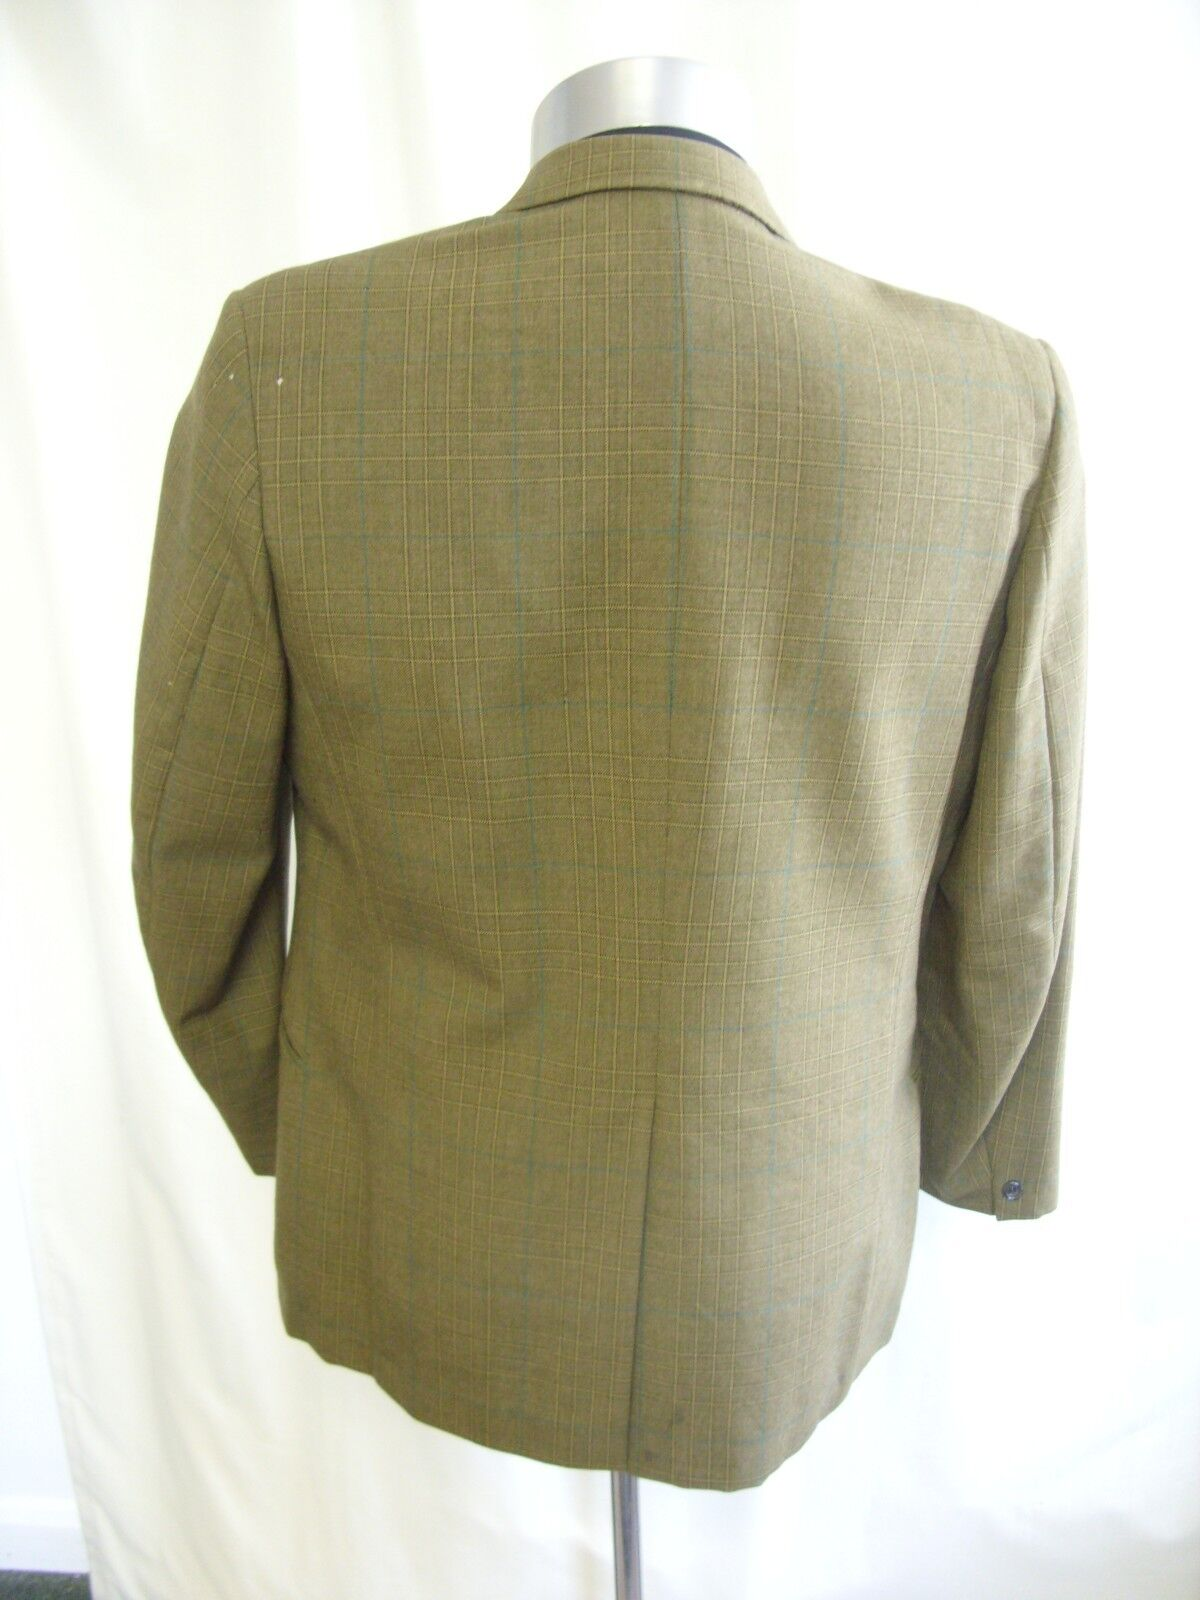 Veste homme Maitland Vert Check Tailor Made Blazer, taille R 40